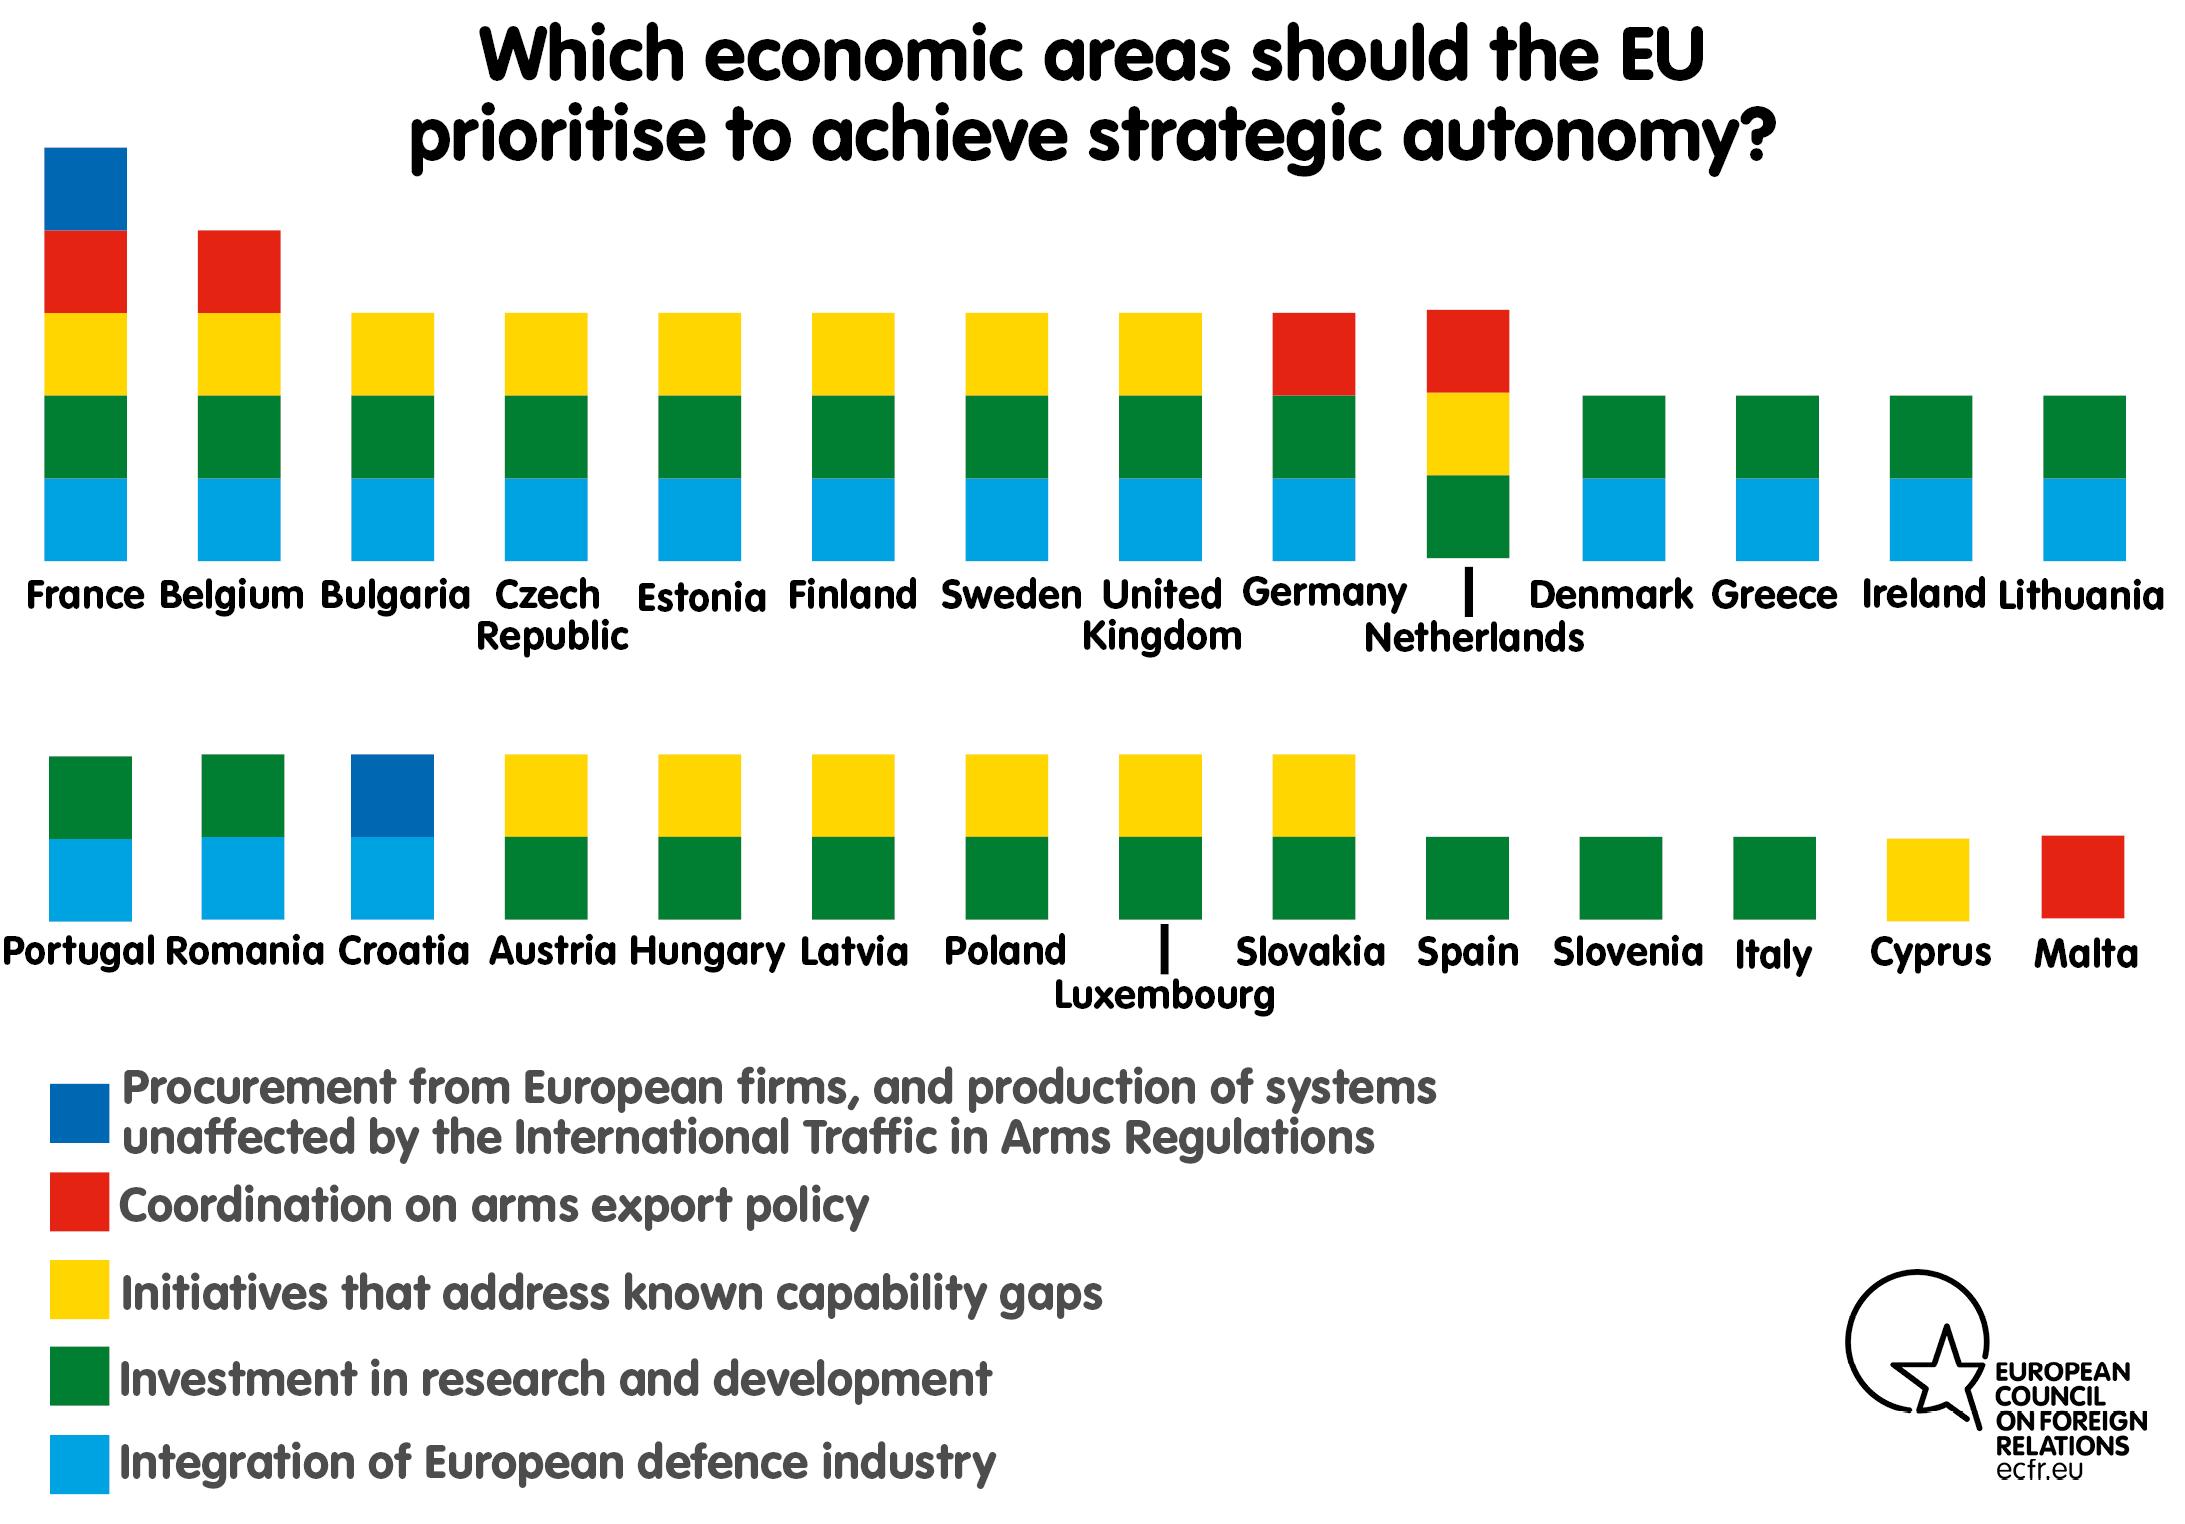 Which economic areas should the EU prioritise to achieve strategic autonomy